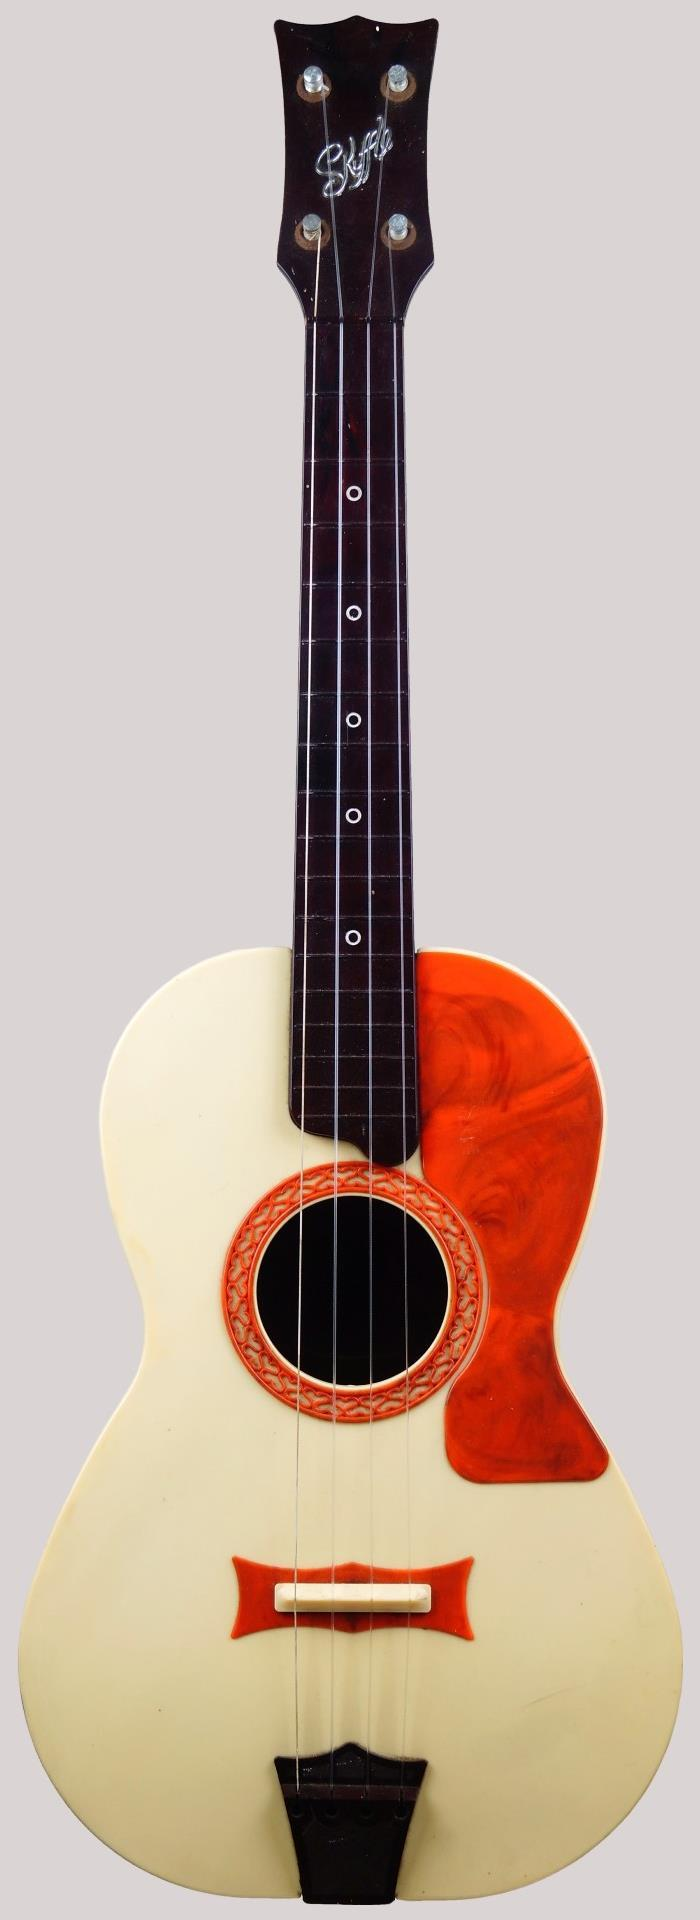 selcol skiffle plastic baritone ukulele